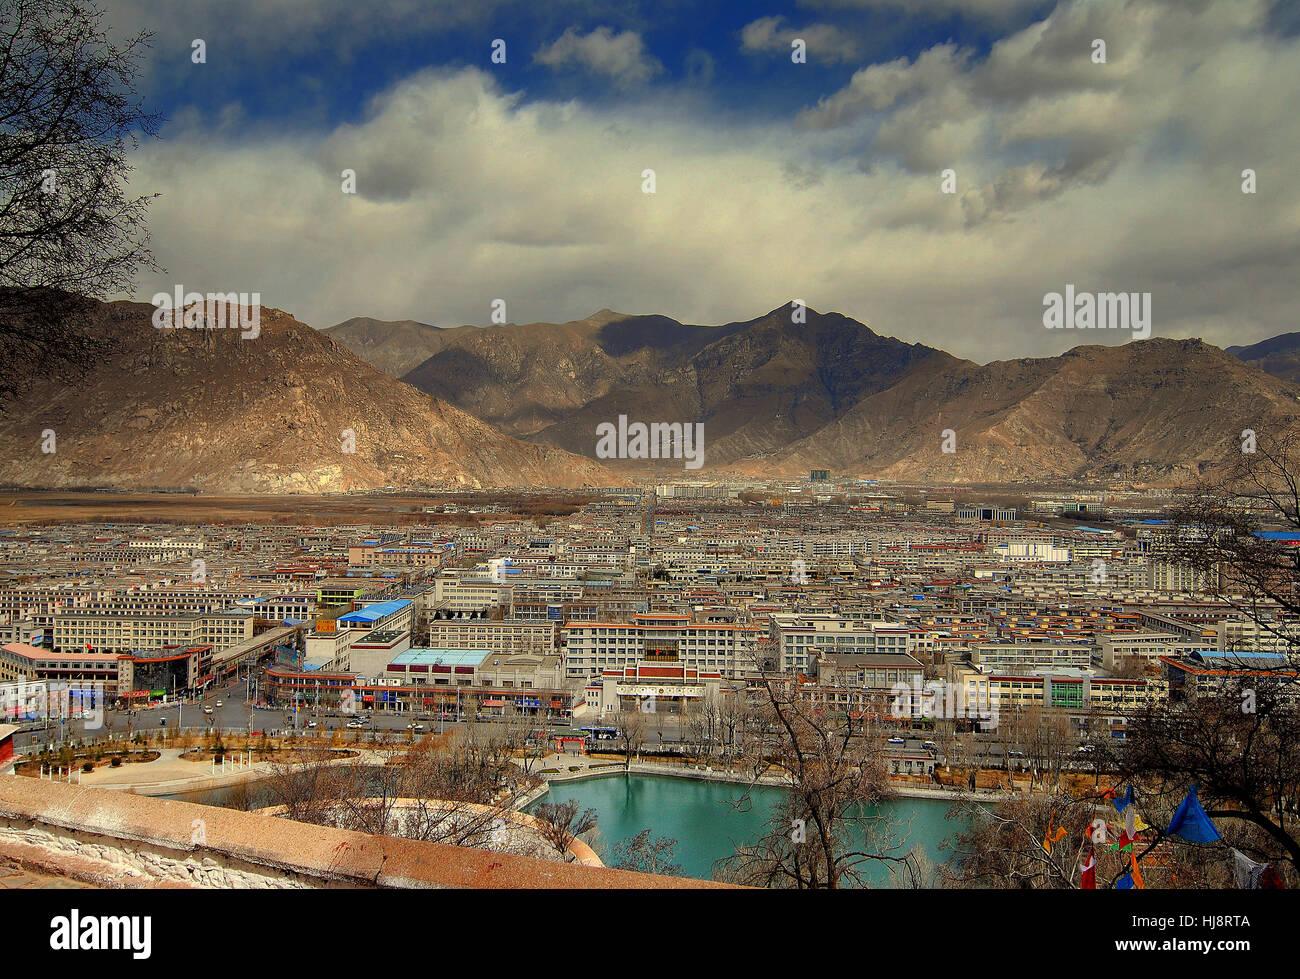 Aerial city view, Lhasa, Tibet, China - Stock Image